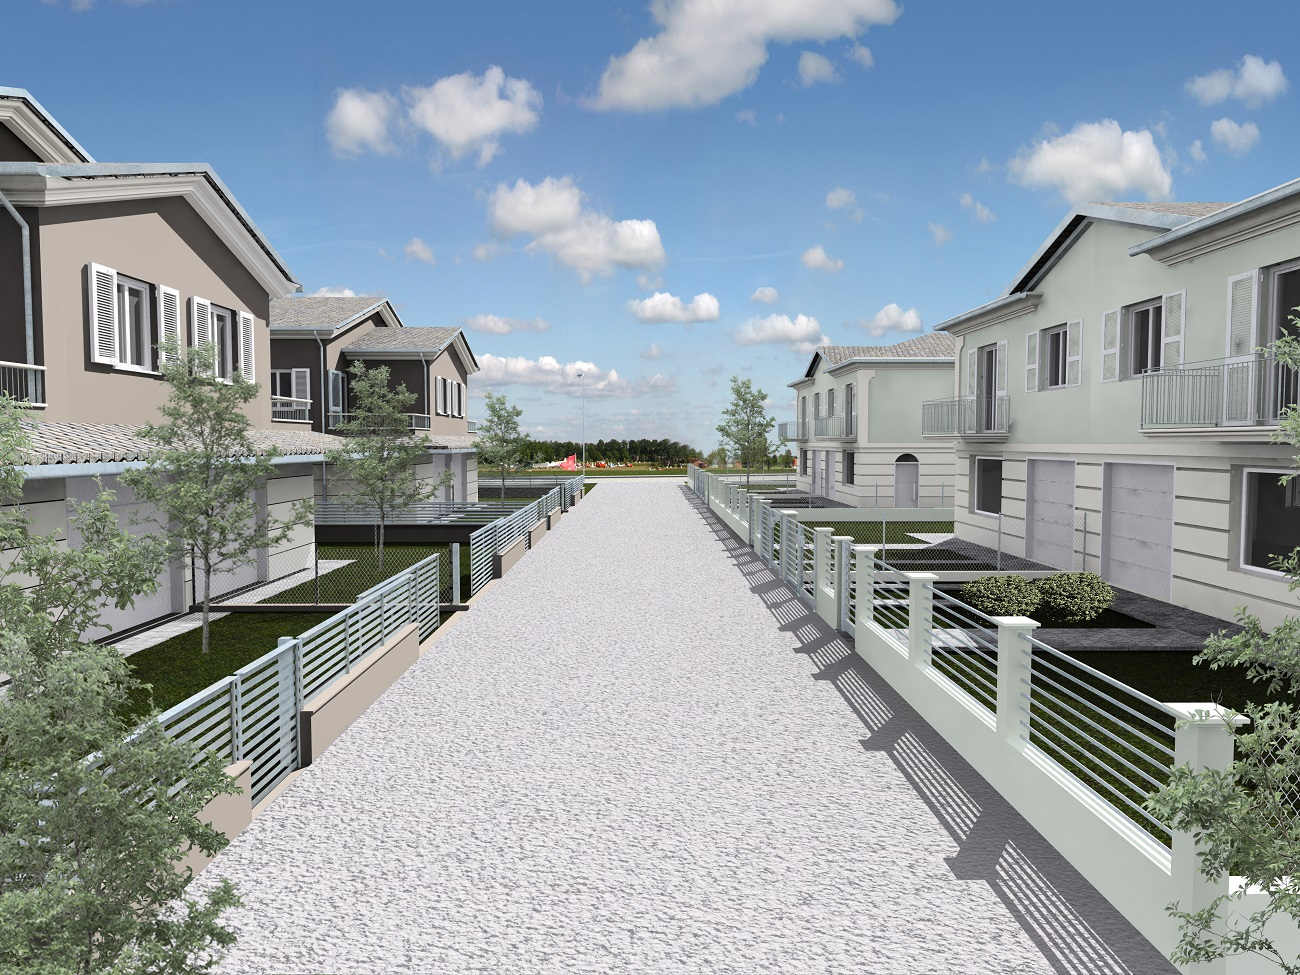 Via Tjader, Classe - Nuova costruzione di ville bifamiliari in Classe A 4